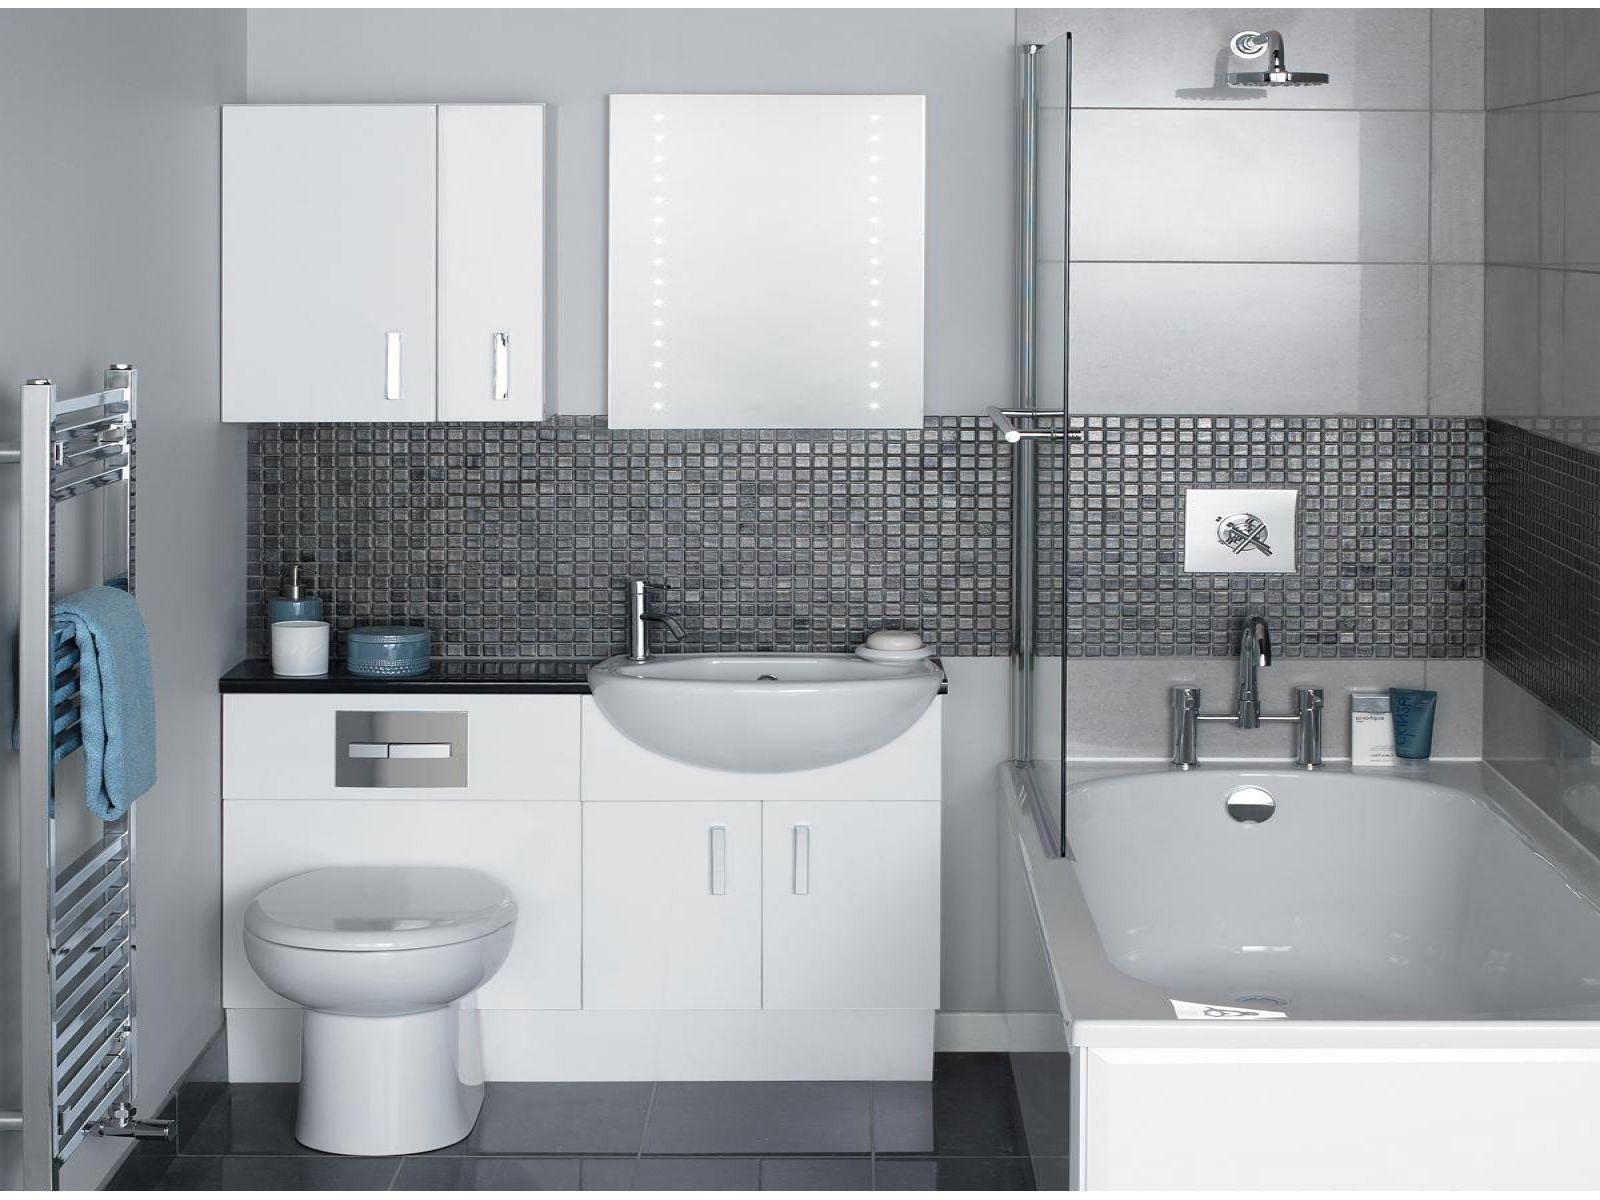 Fancy Bathroom With Black Mosaic | Ideas for the House | Pinterest ...